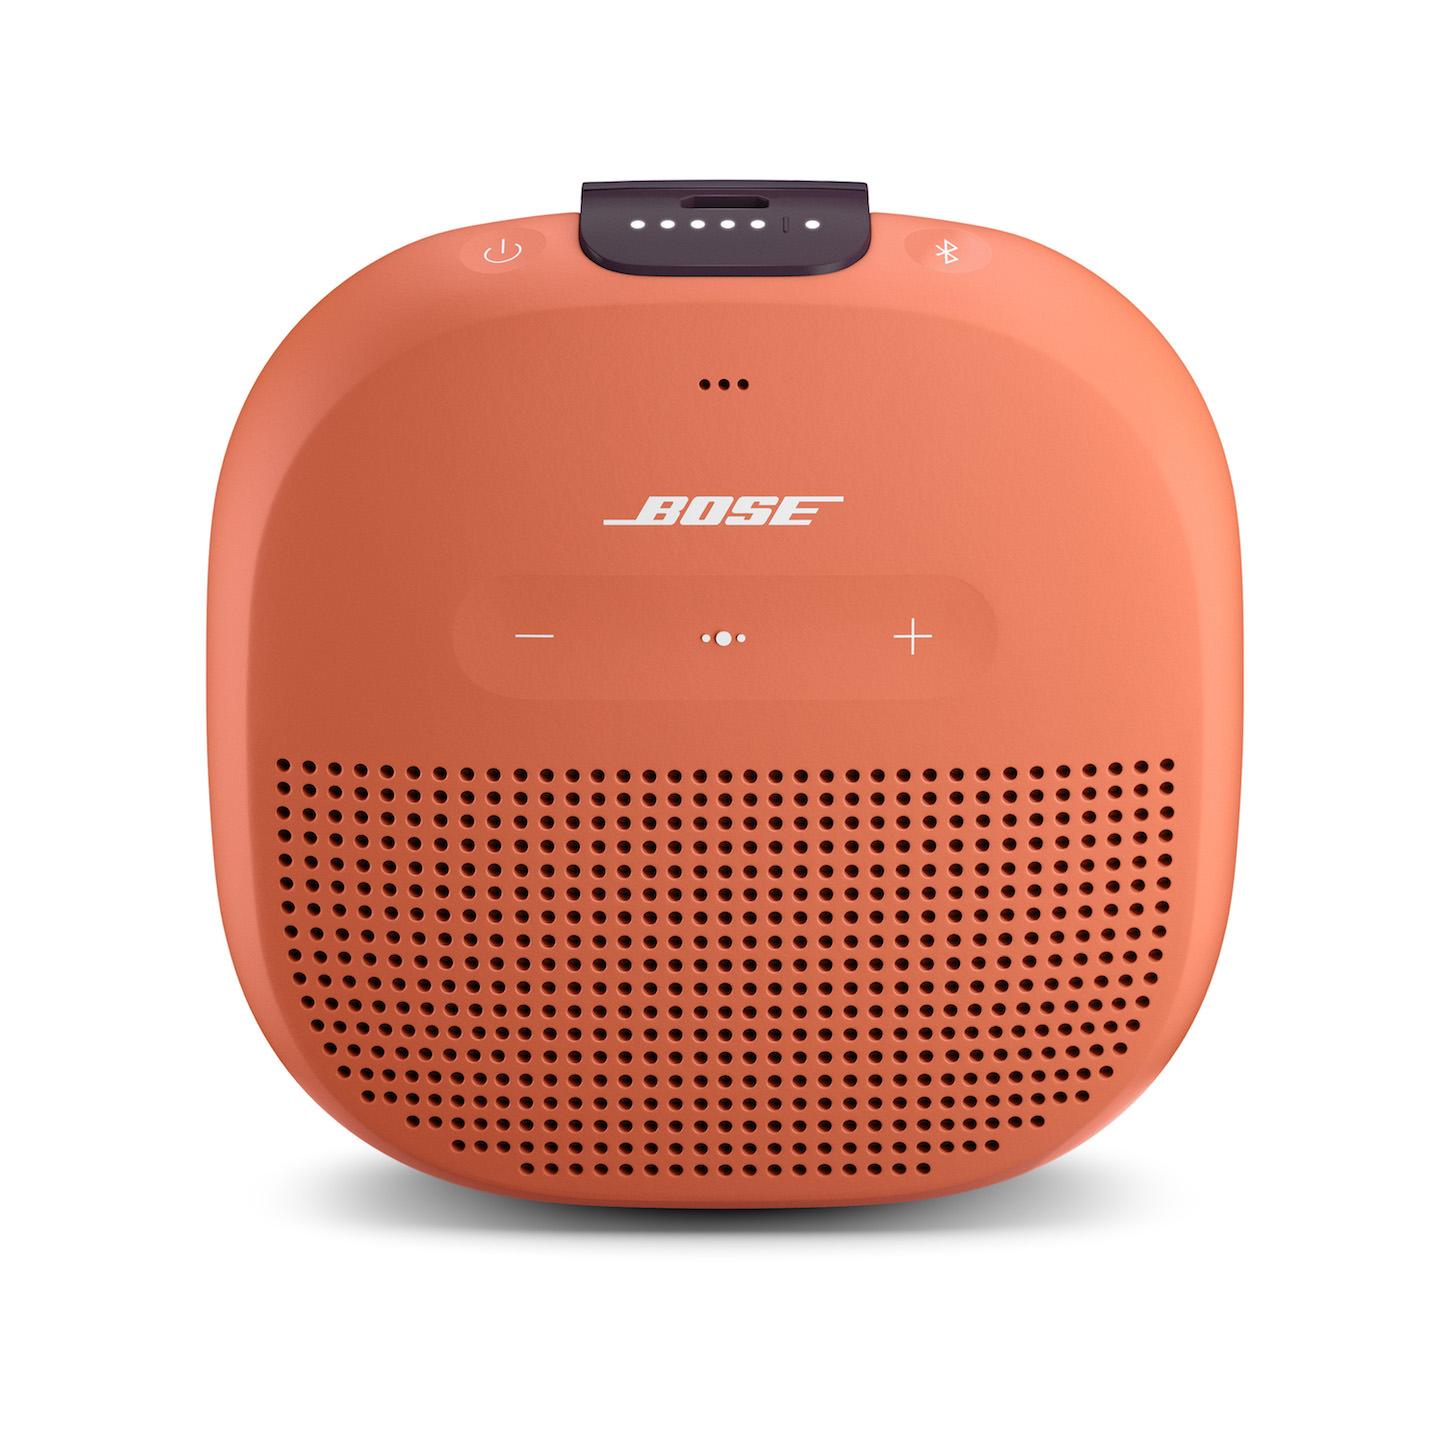 SoundLink-Micro-Bluetooth-Speaker_1854_5.jpg